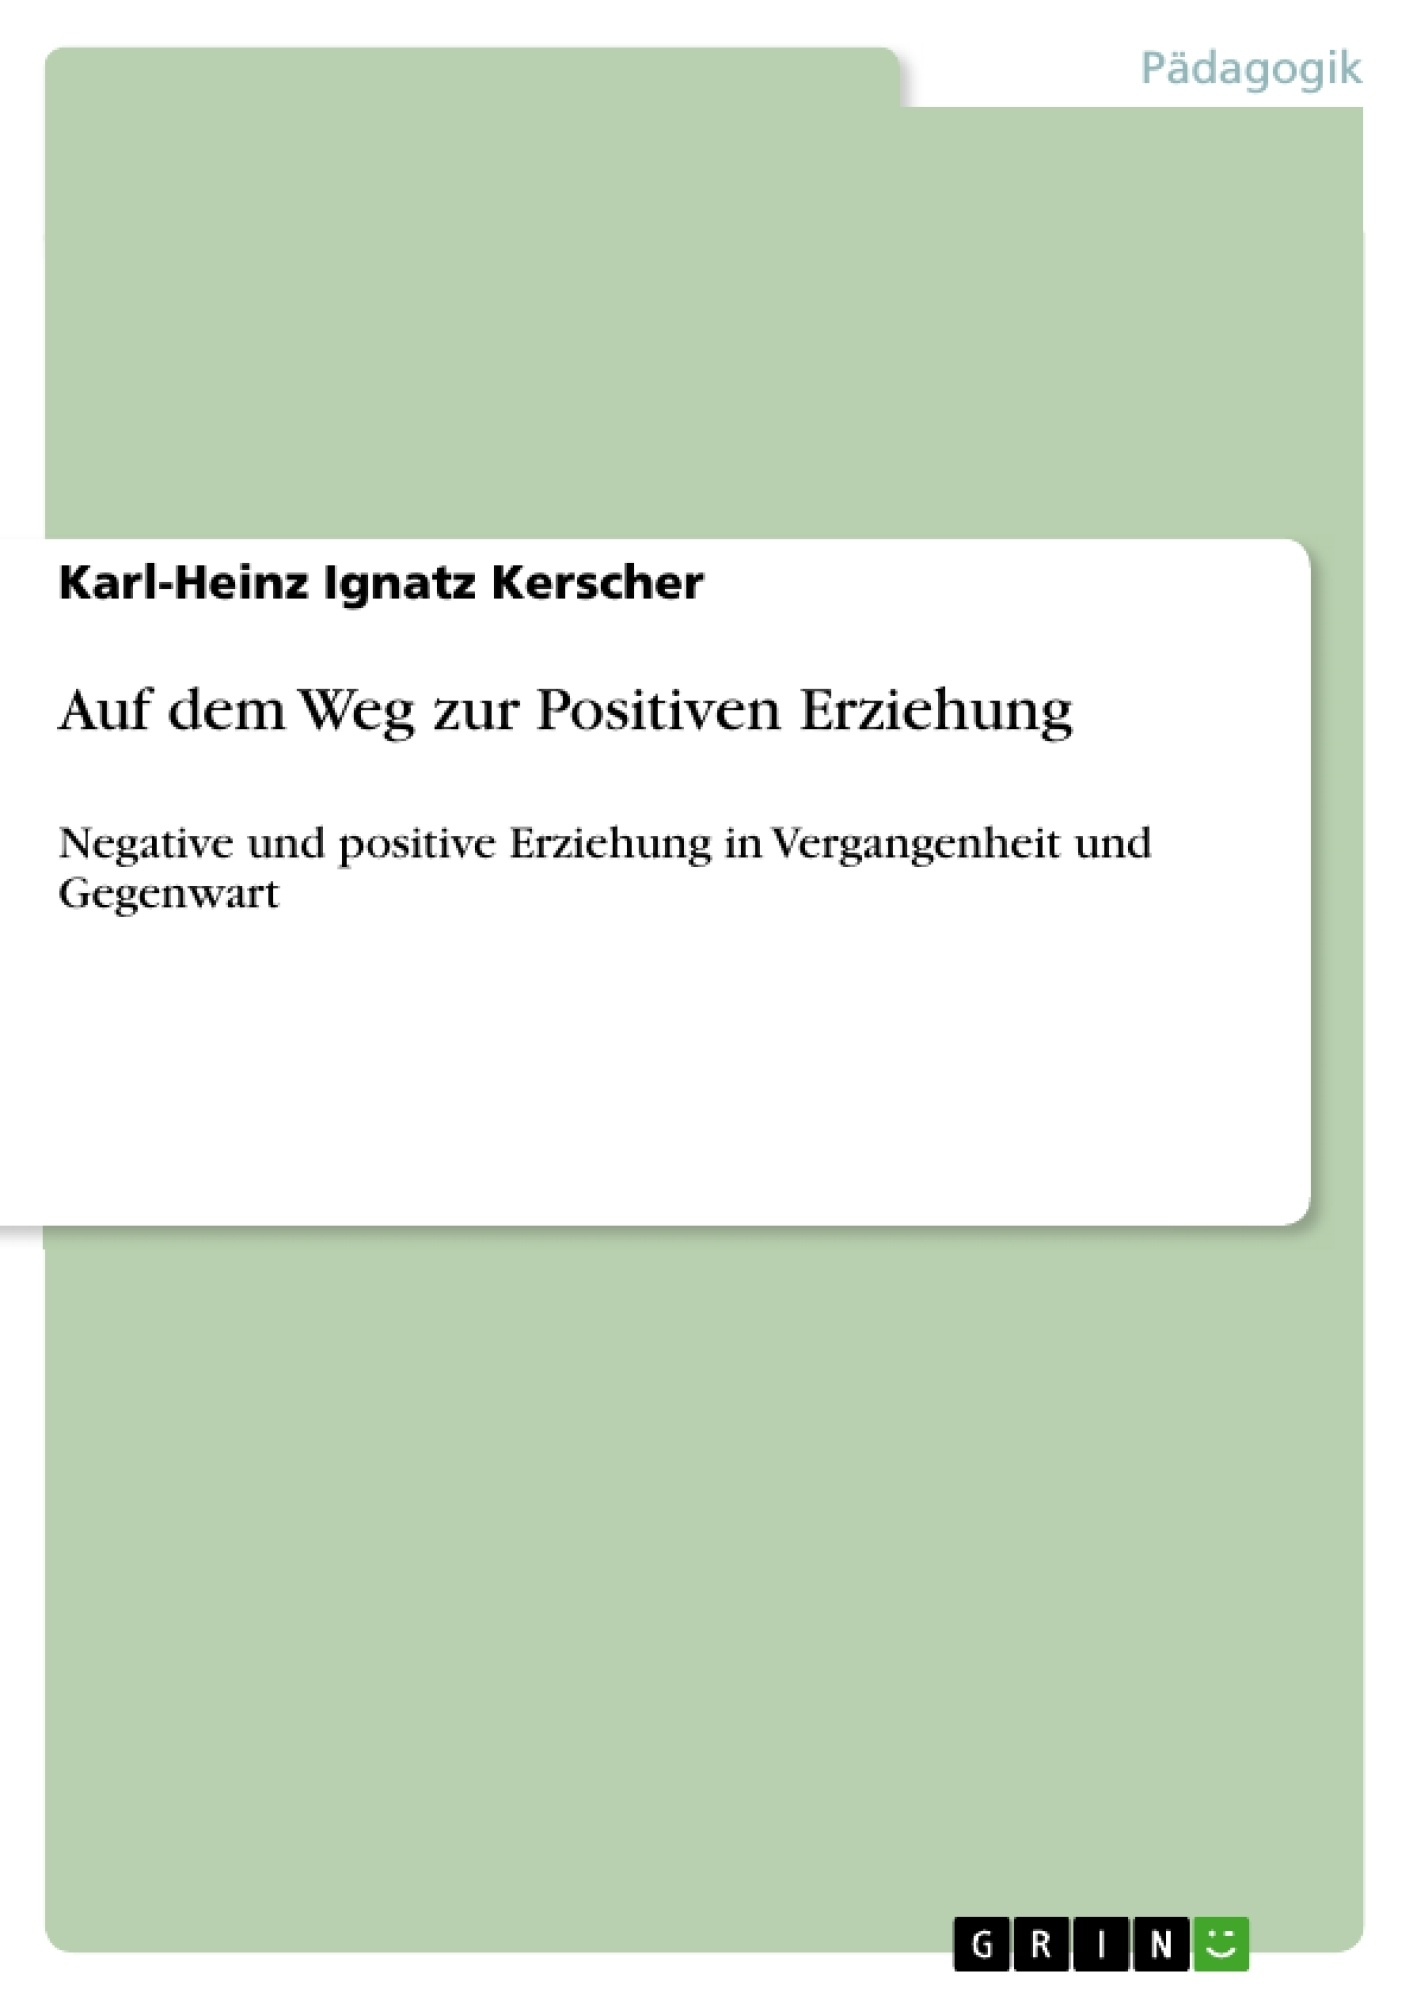 Titel: Auf dem Weg zur Positiven Erziehung